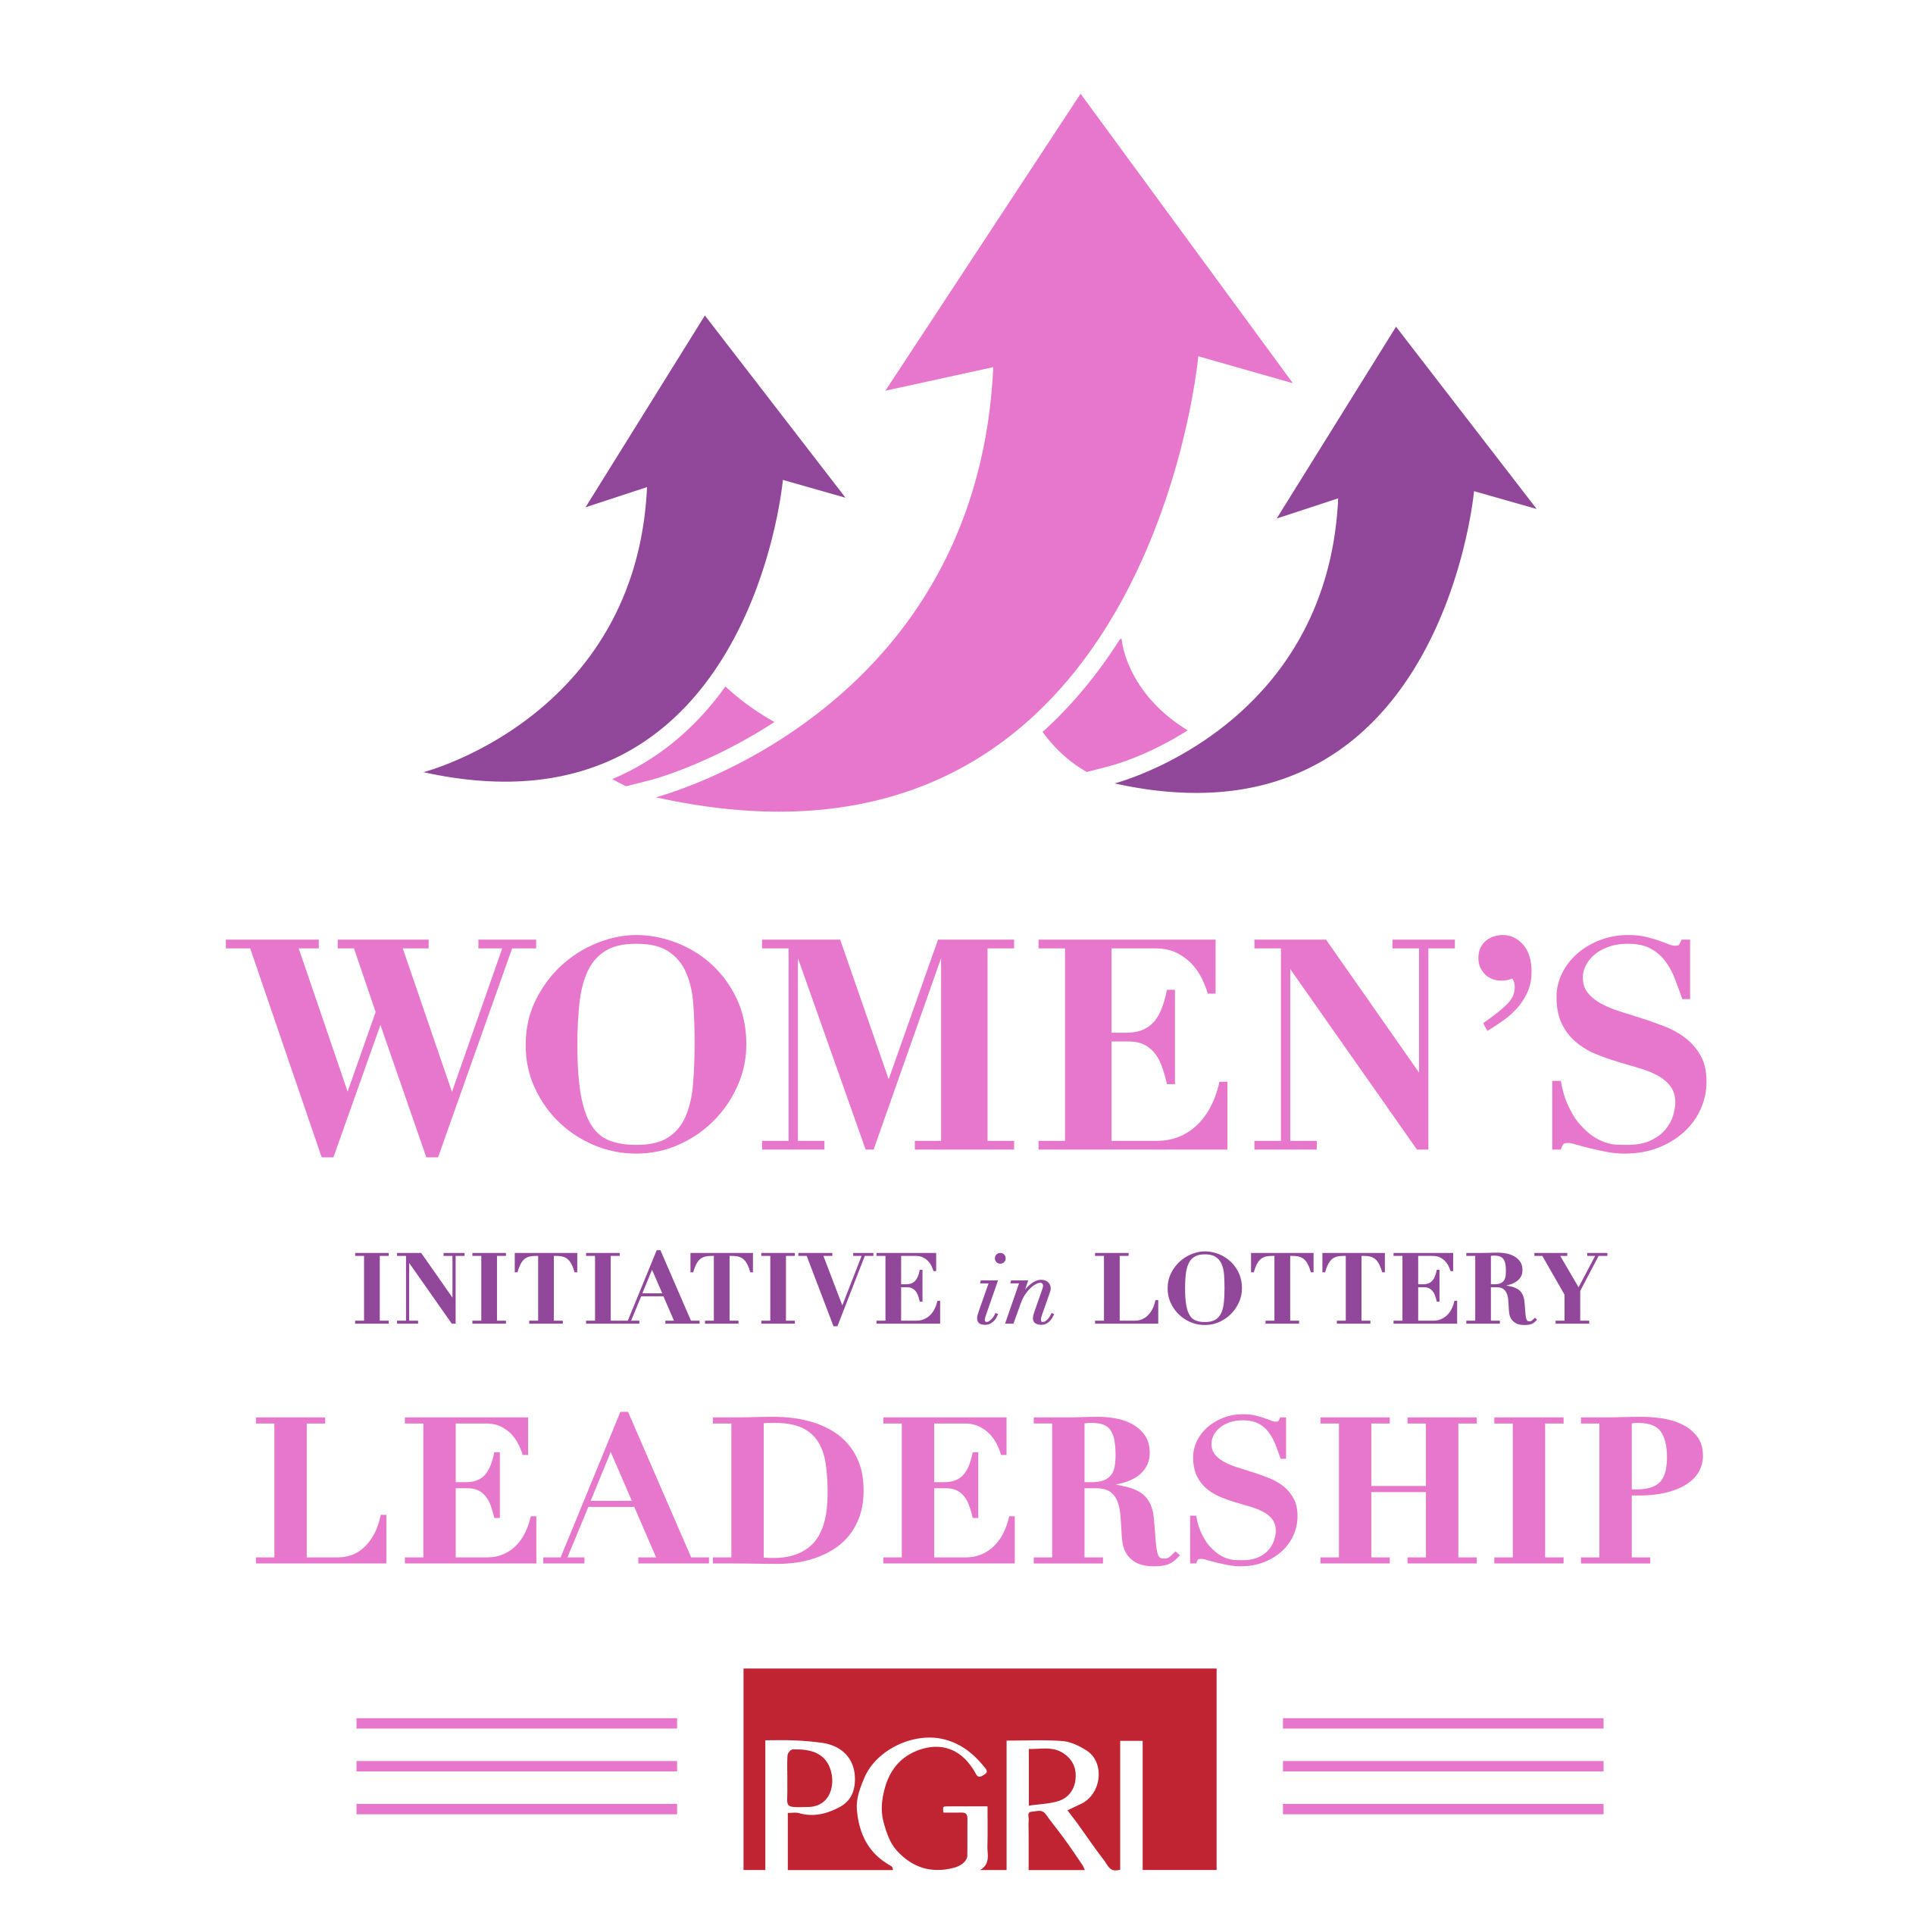 PGRI's Women's Initiative in Lottery Leadership